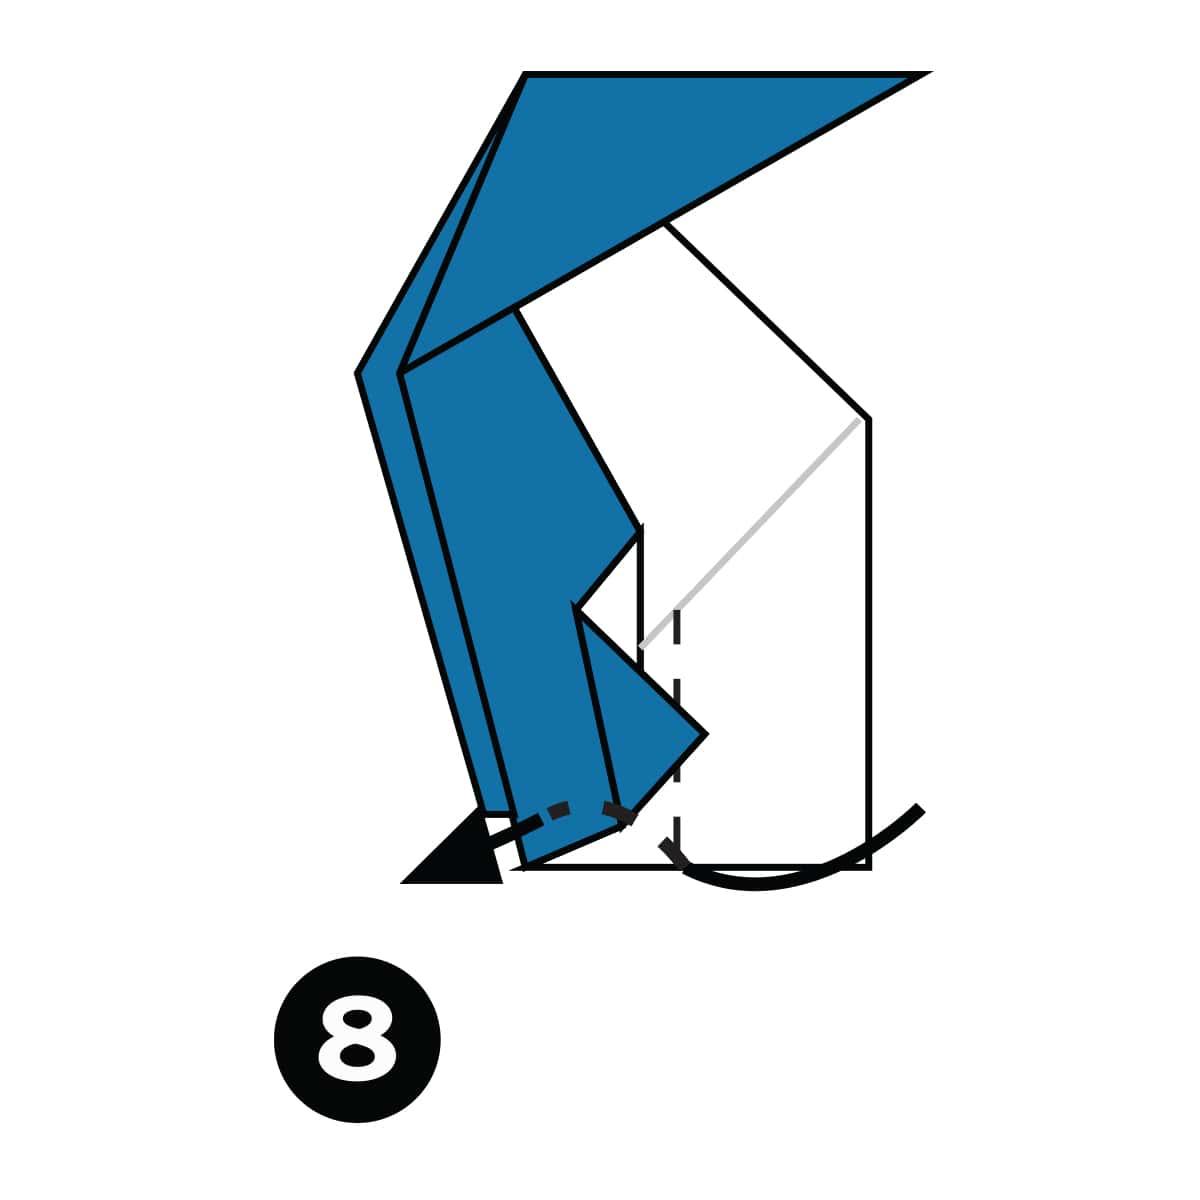 Penguin Step 8